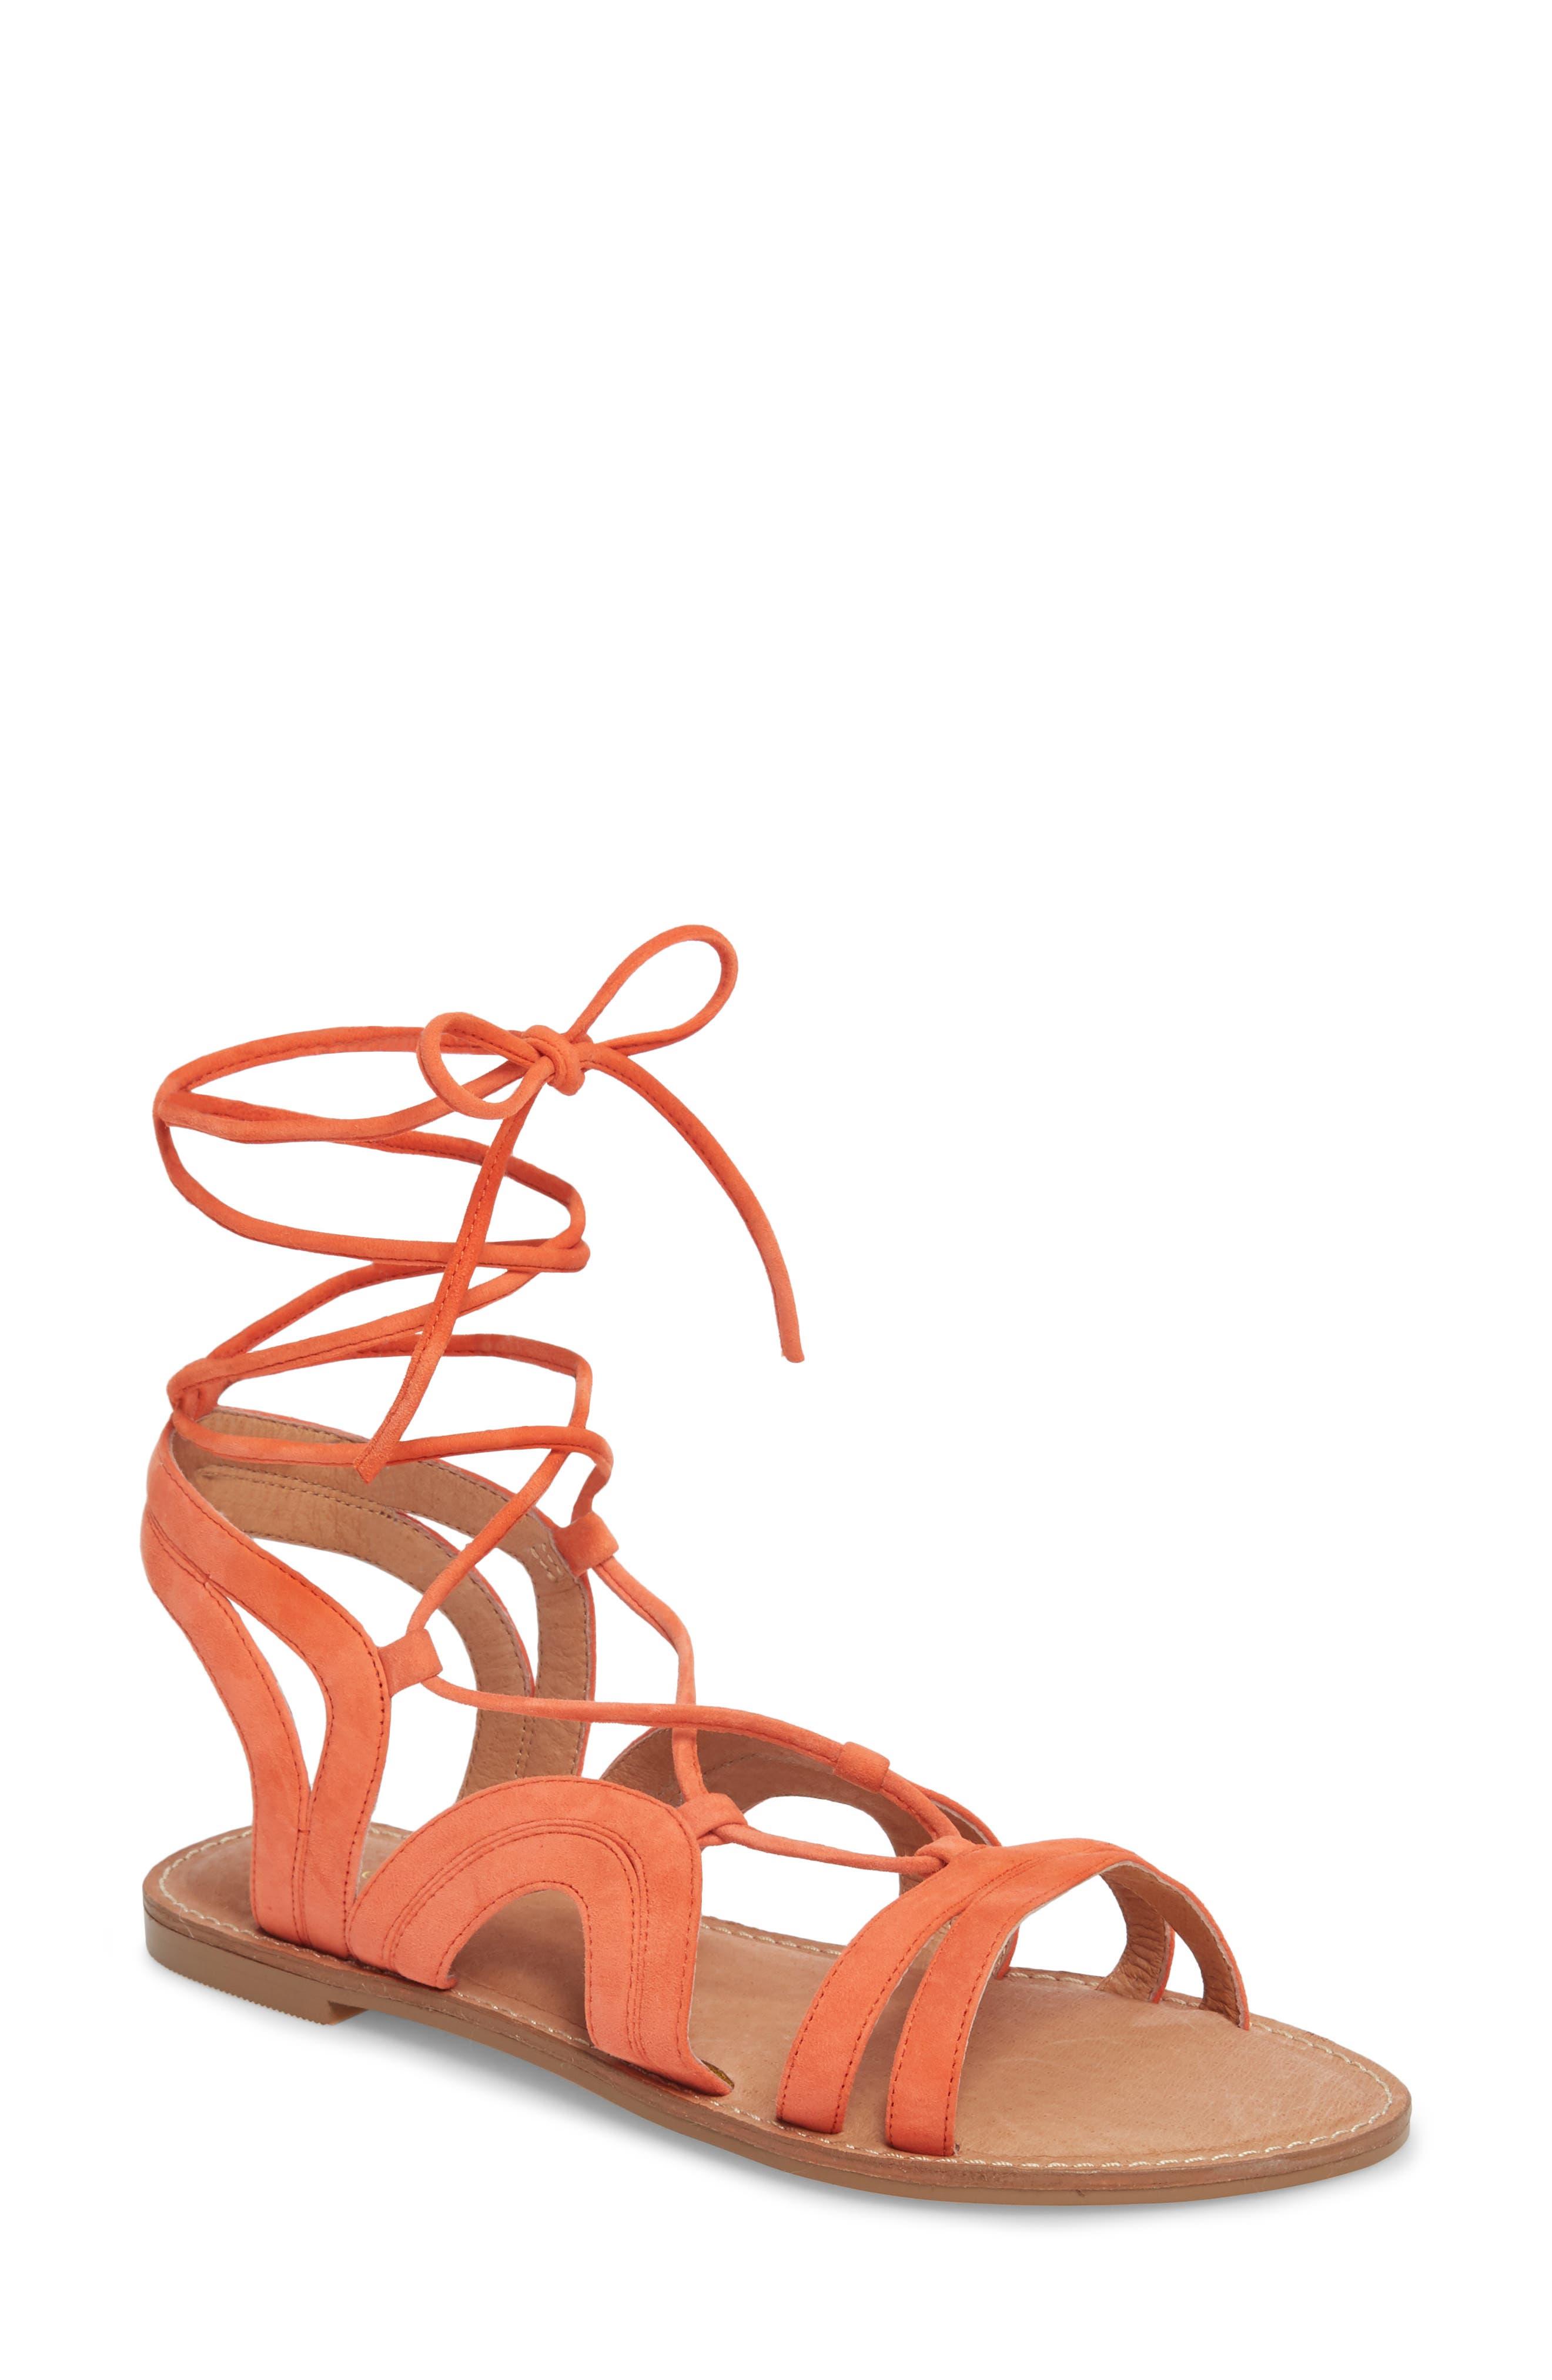 Lilian Gladiator Sandal,                         Main,                         color, Orange Suede